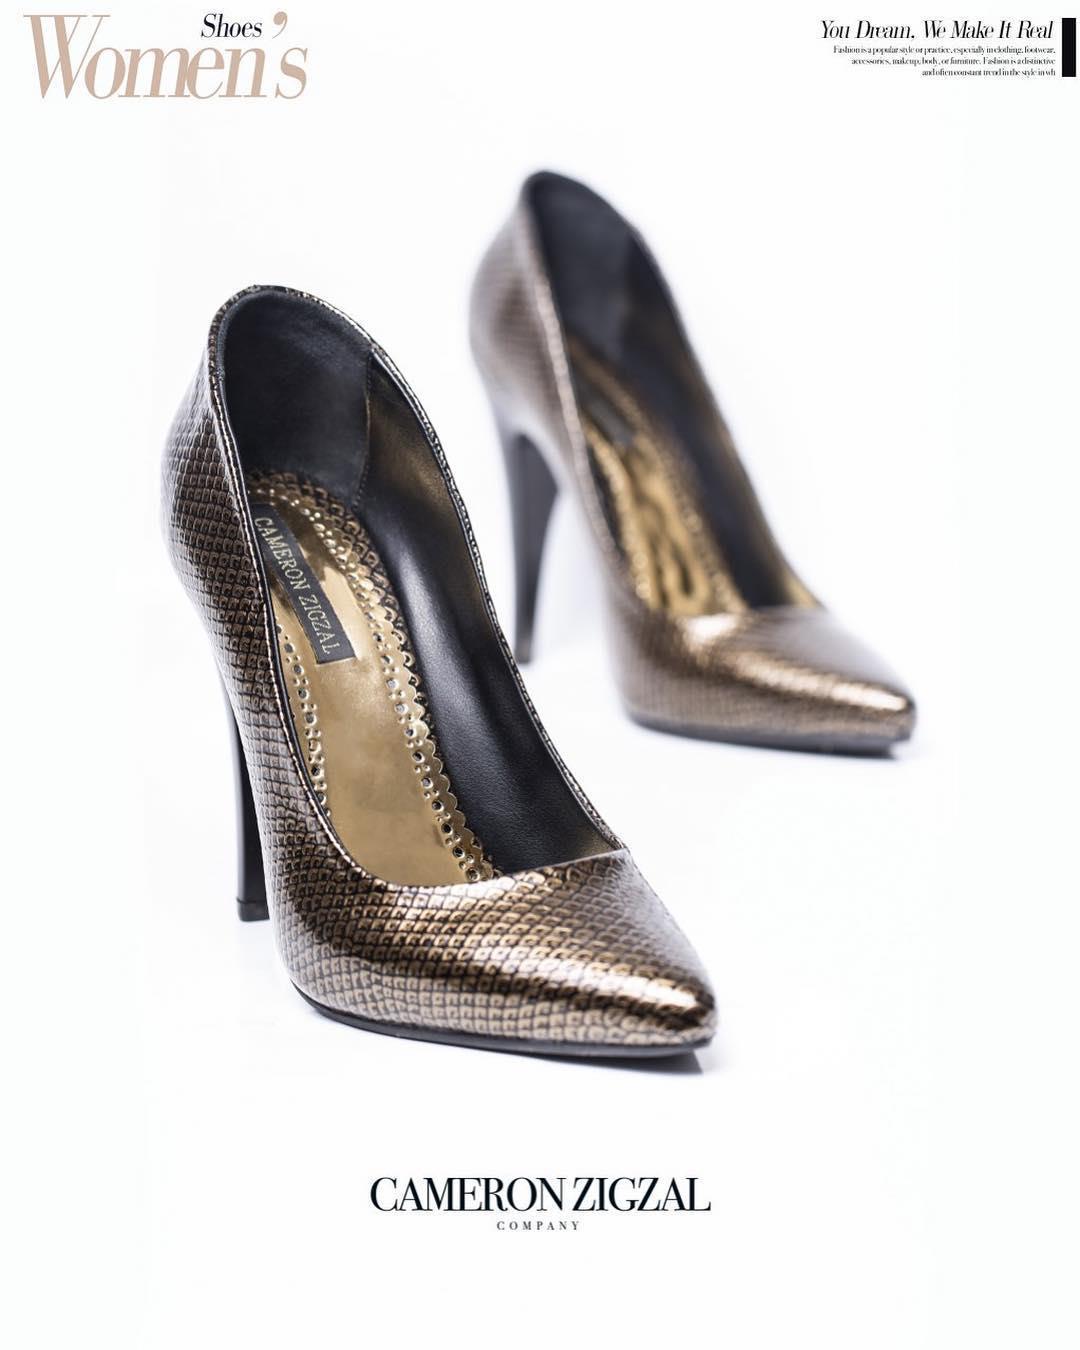 Cameronzigzal's women collecti